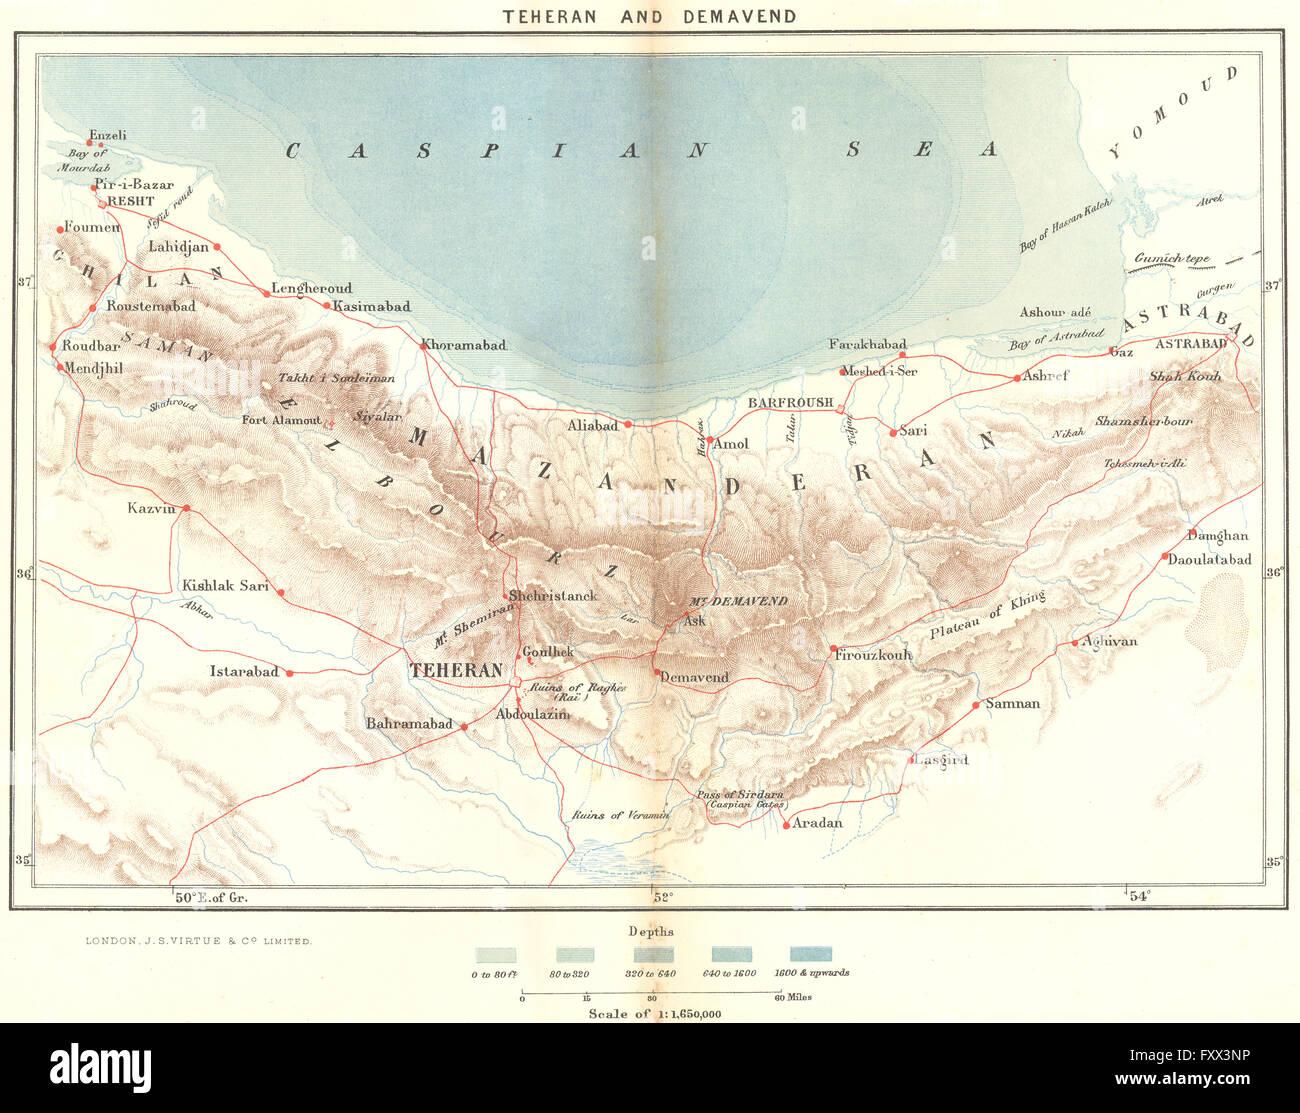 IRAN: Tehran & Demavend, c1885 antique map Stock Photo: 102606610 ...